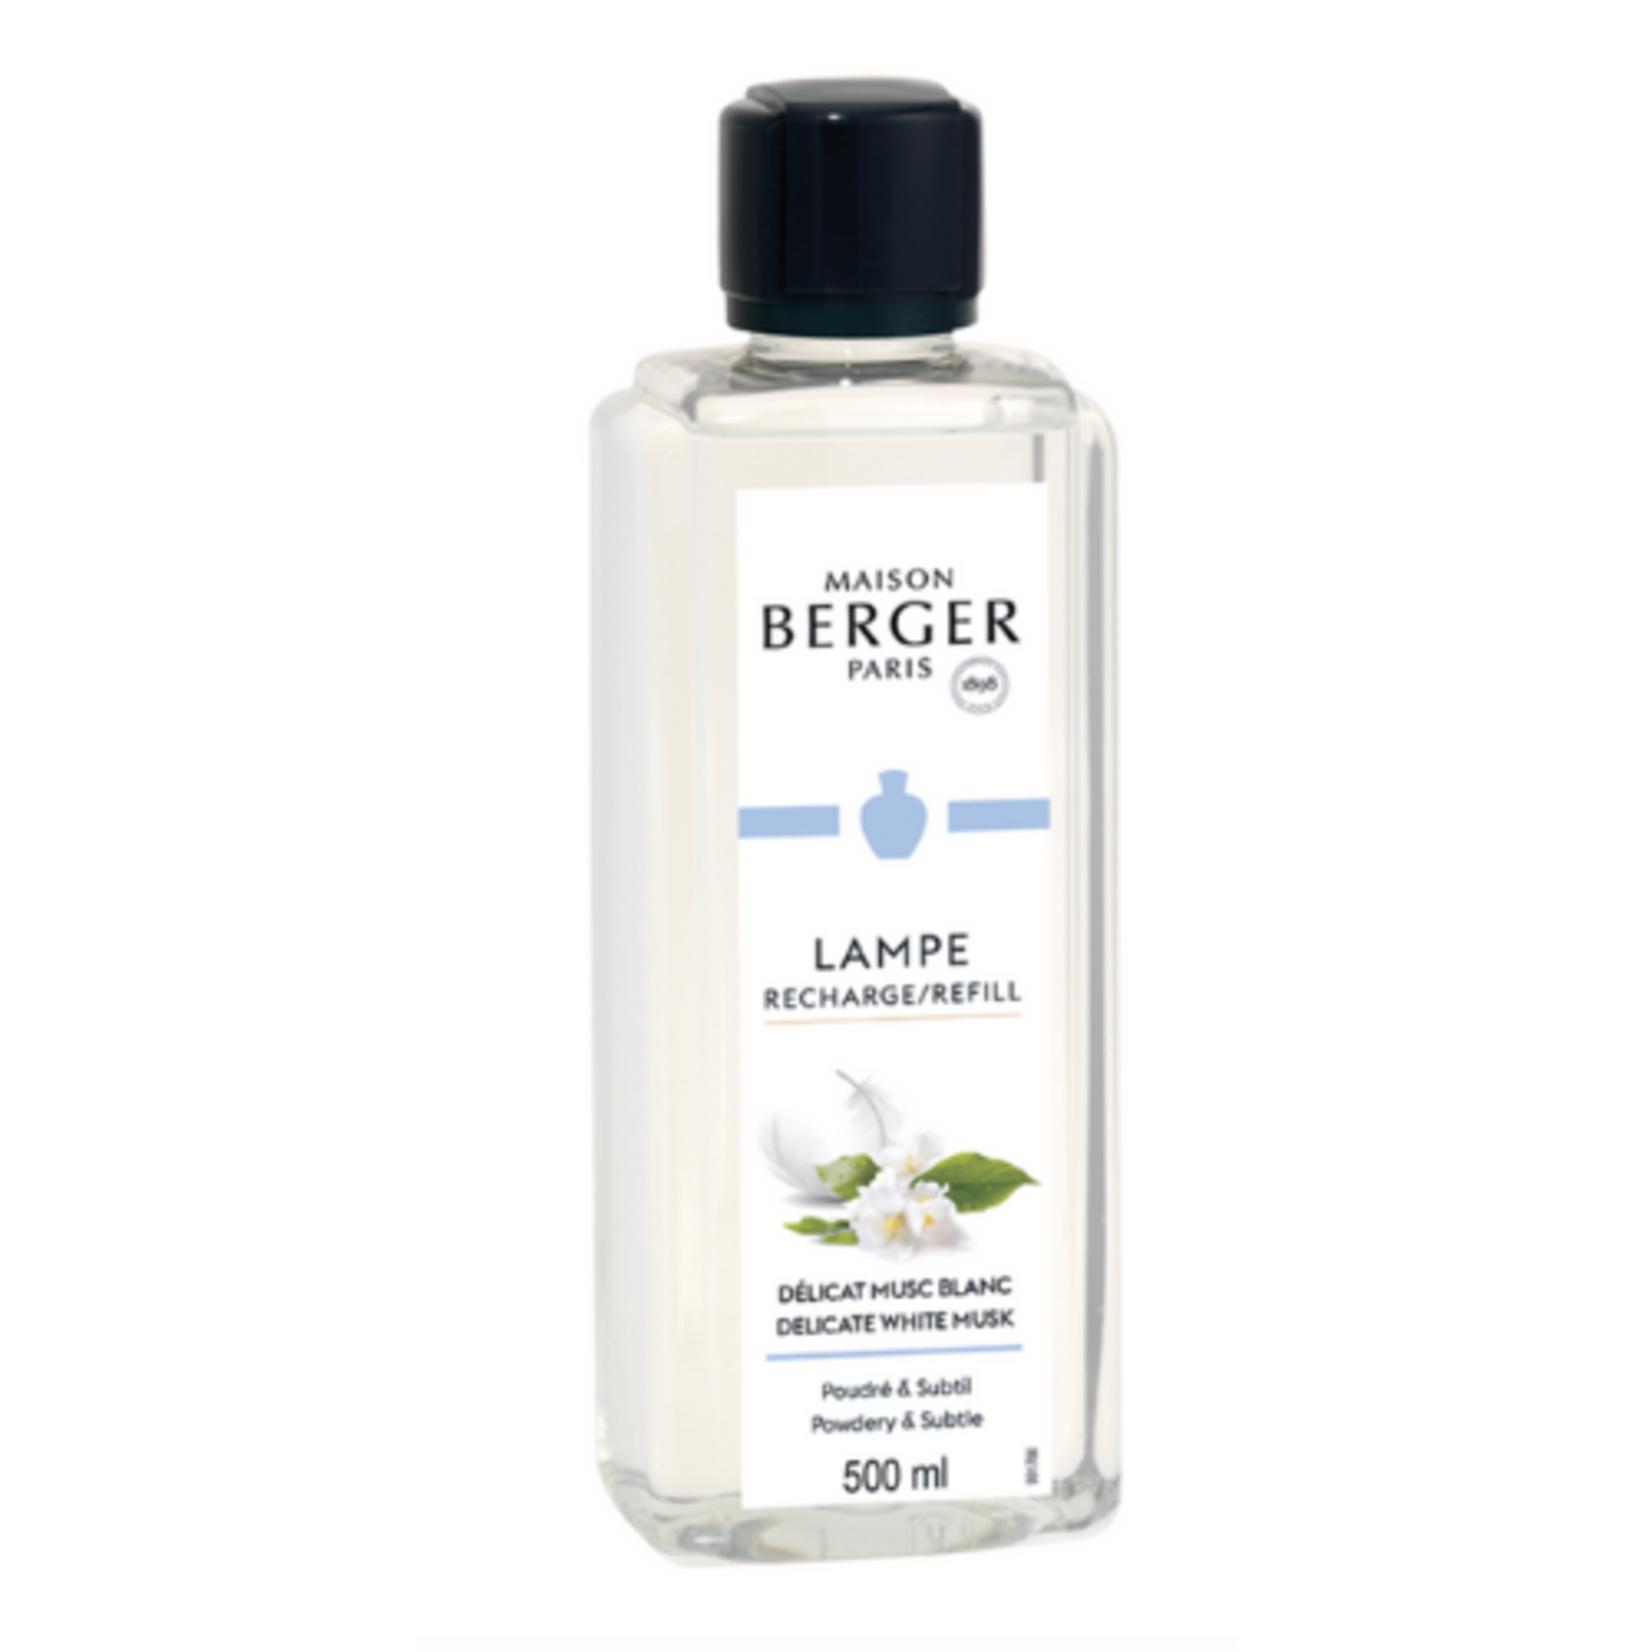 Lampe Berger Lampe Berger Huisparfum 500ml Délicat Musc Blanc / Delicate White Musk